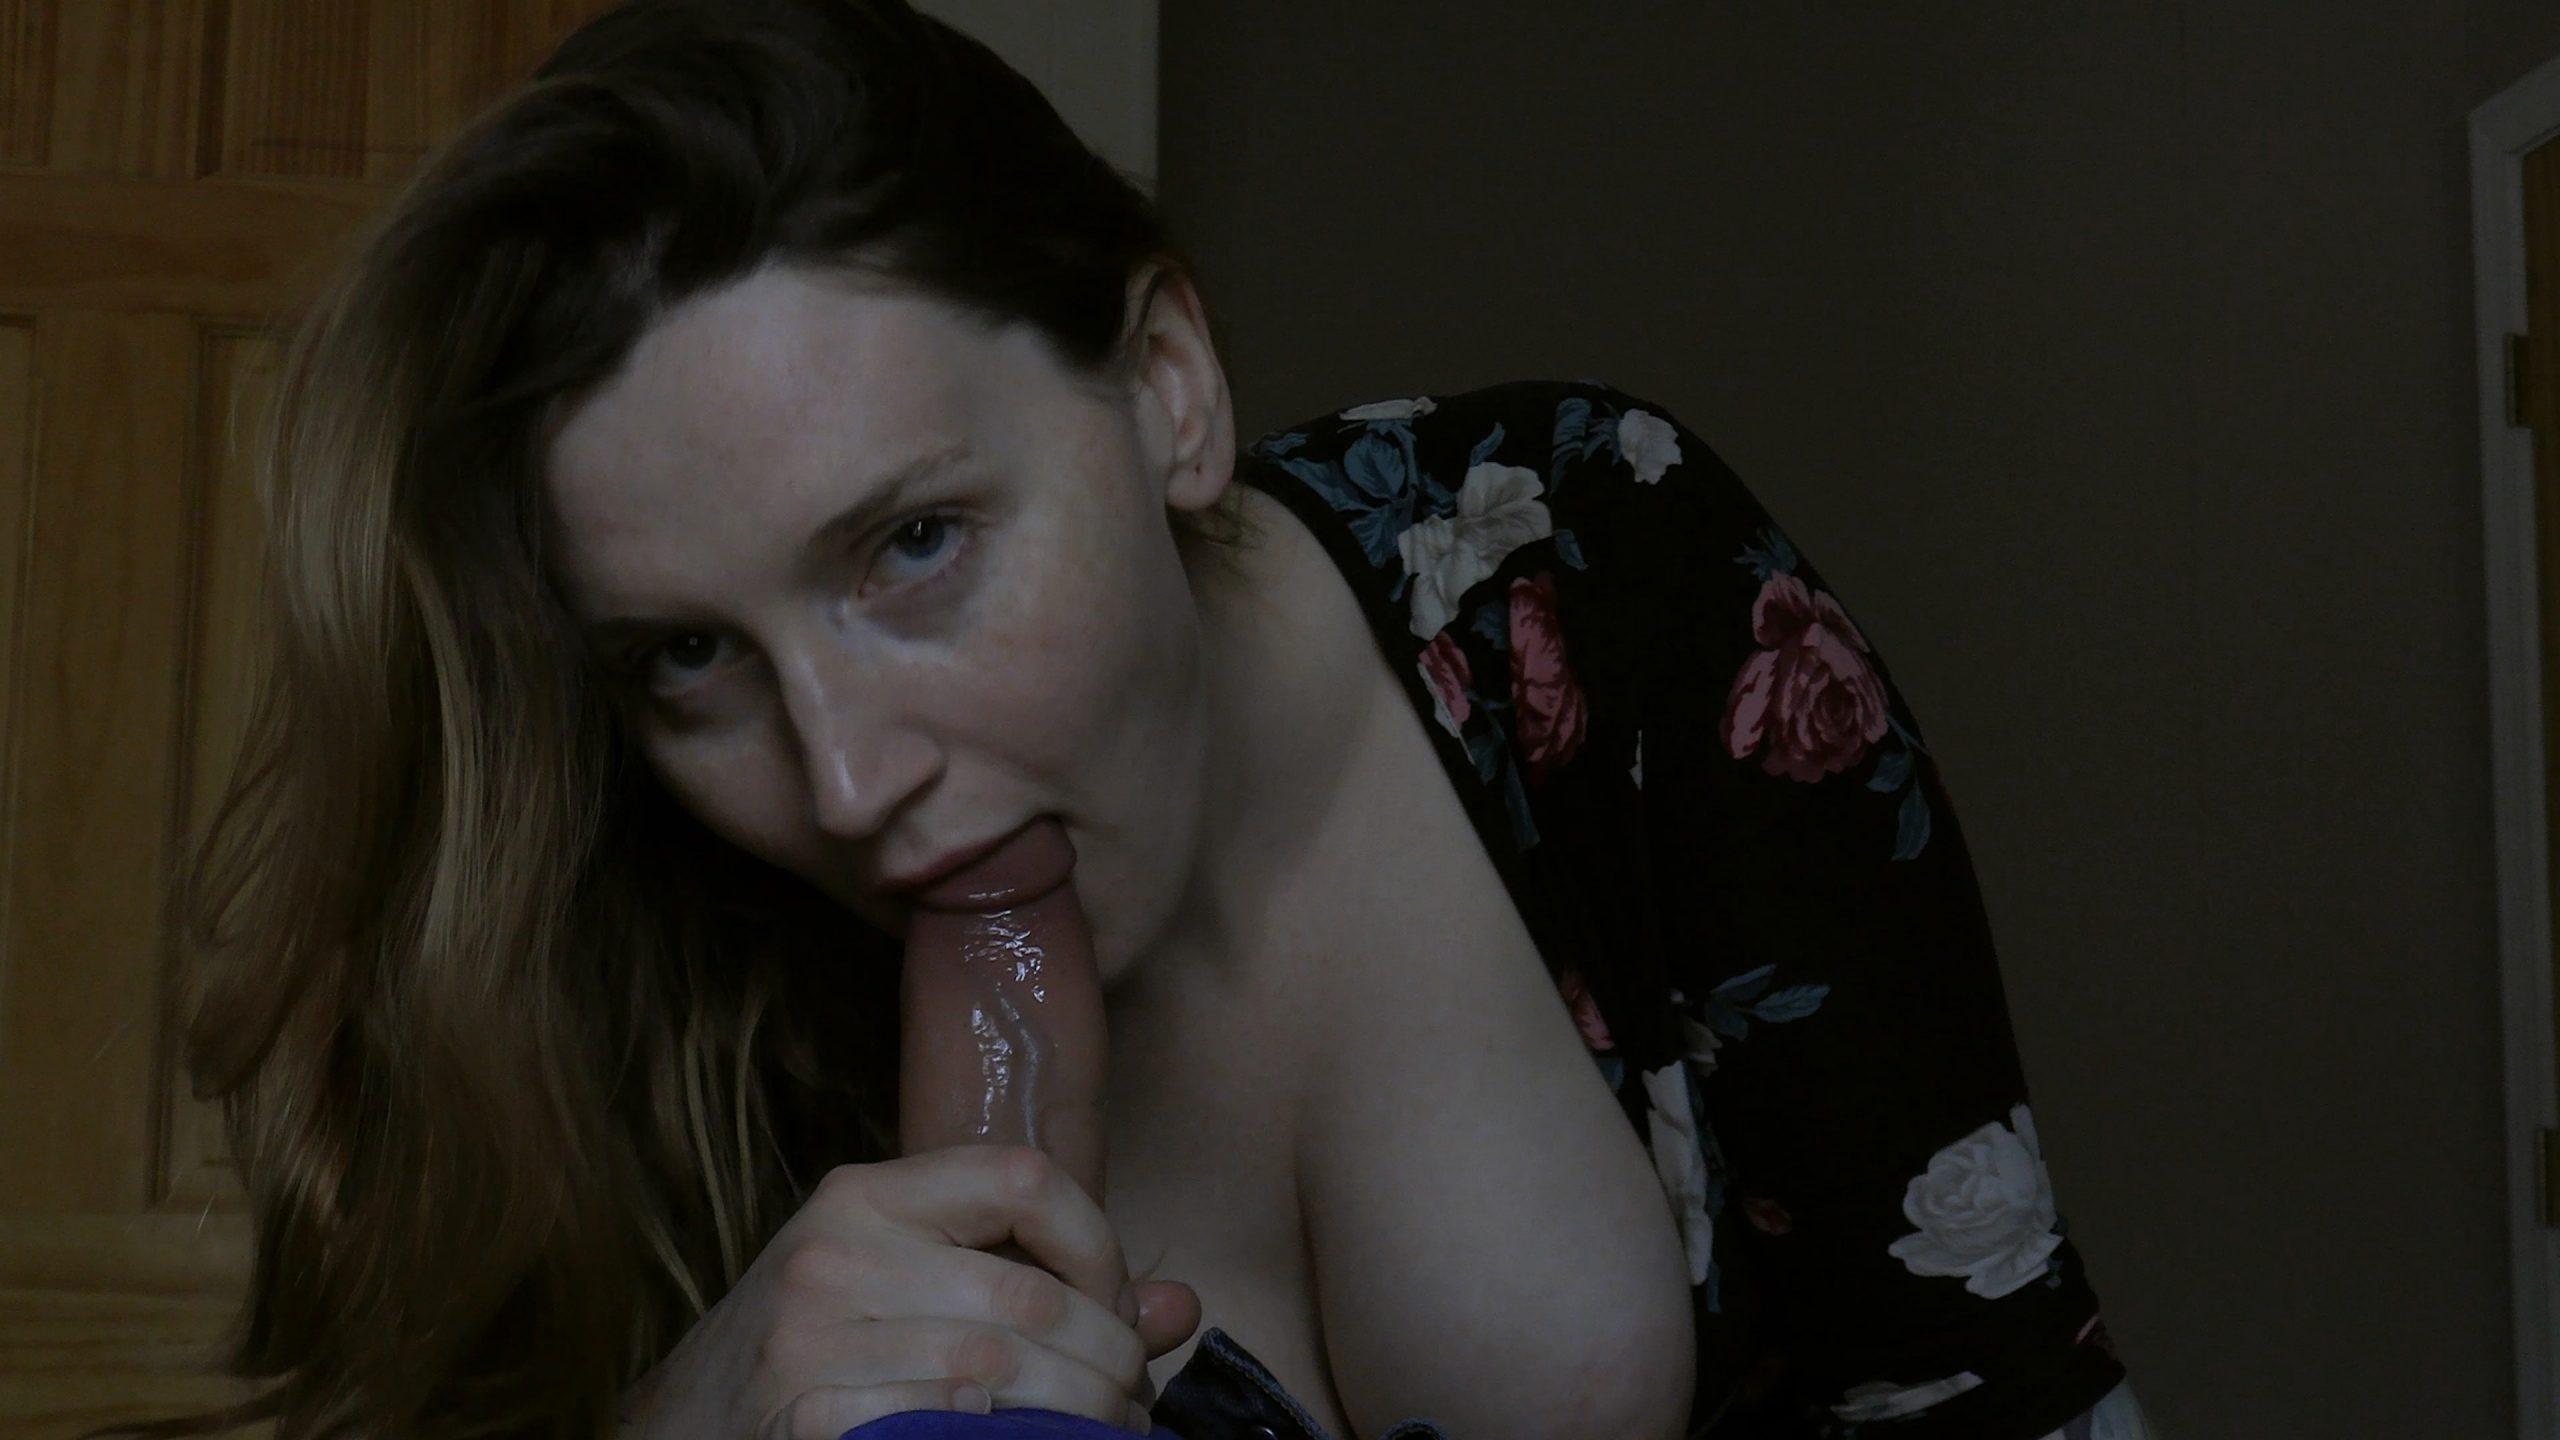 Bettie Bondage - Auntie Needs Attention 4K